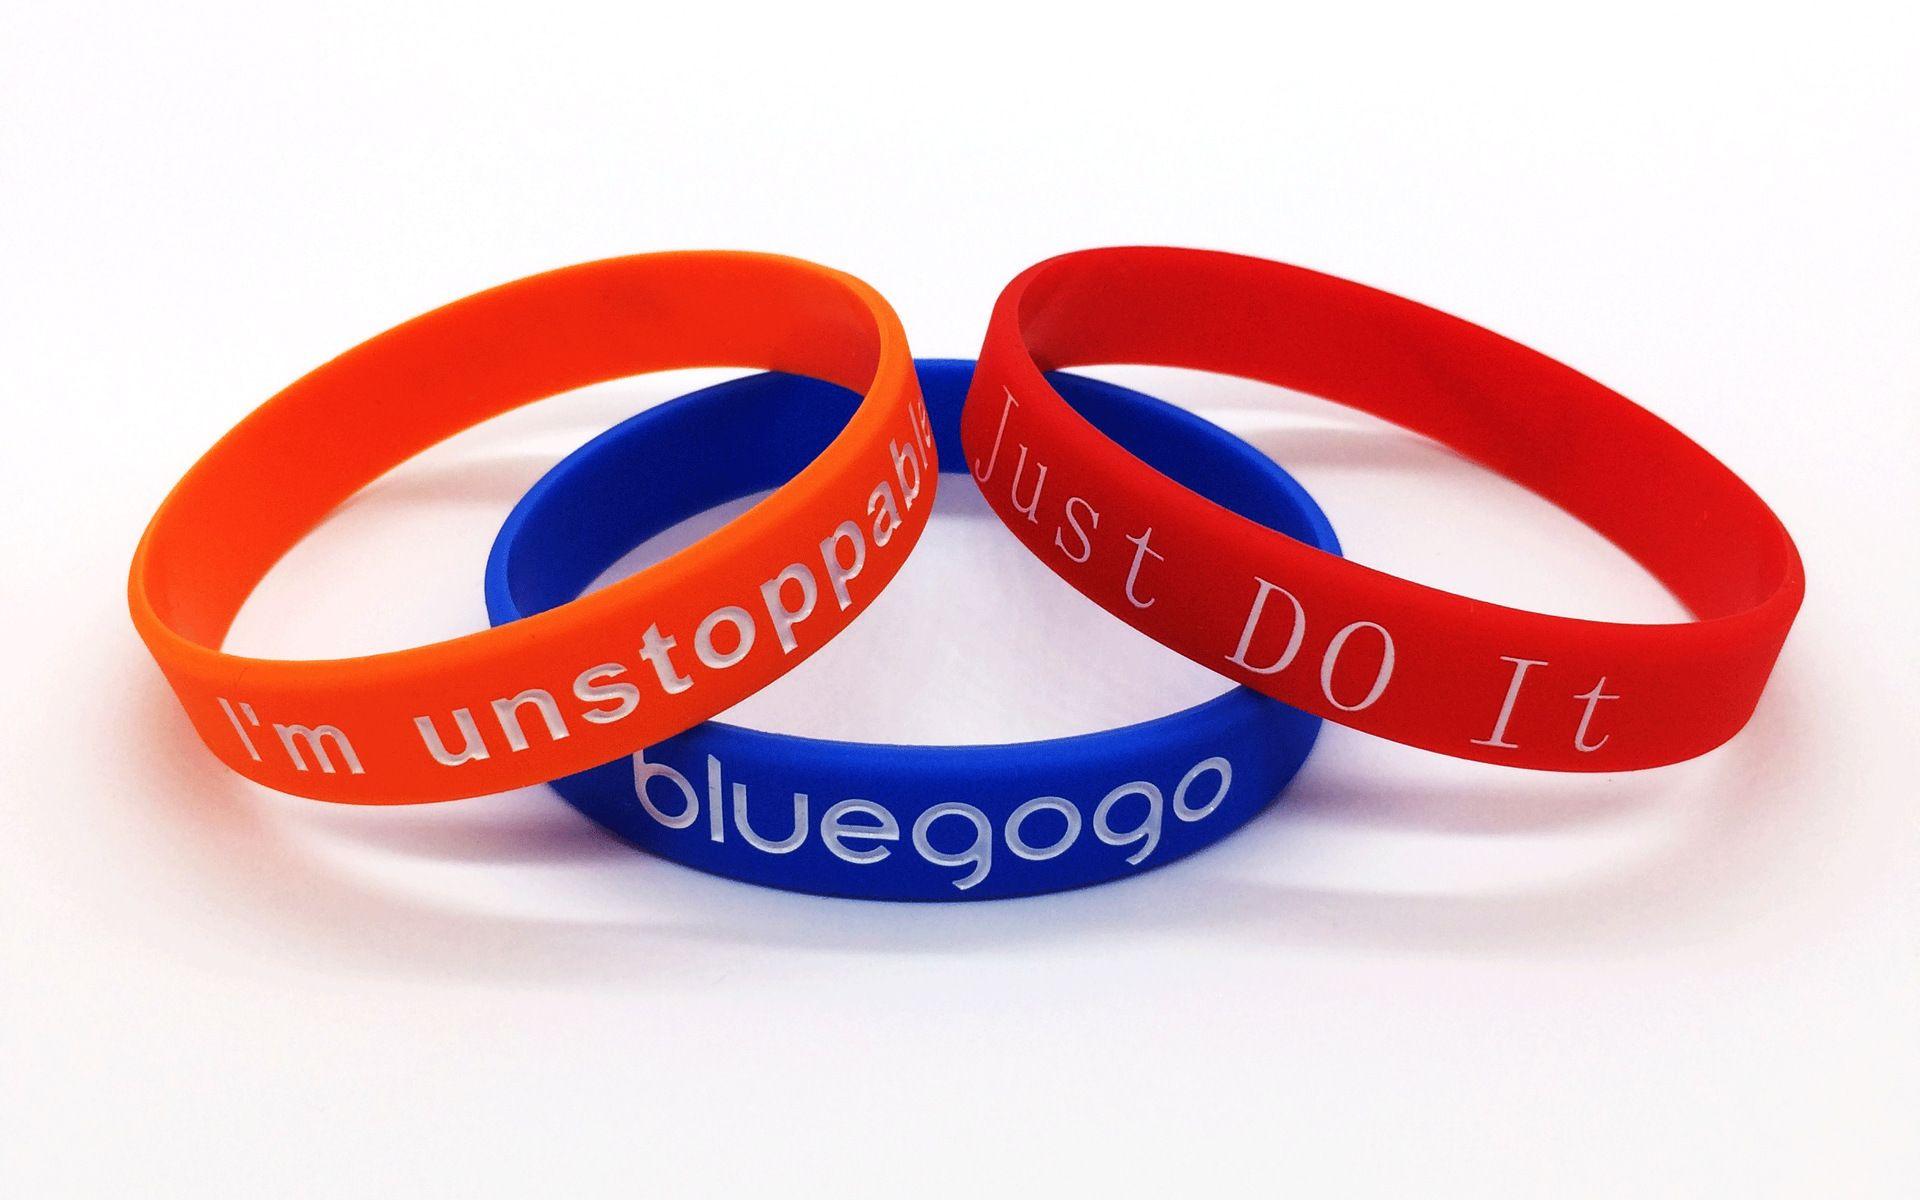 wholesale silicone bracelet engraving printing silicone wrist band rubber hand wrist strap loop drive midge unisex charm bracelet D021